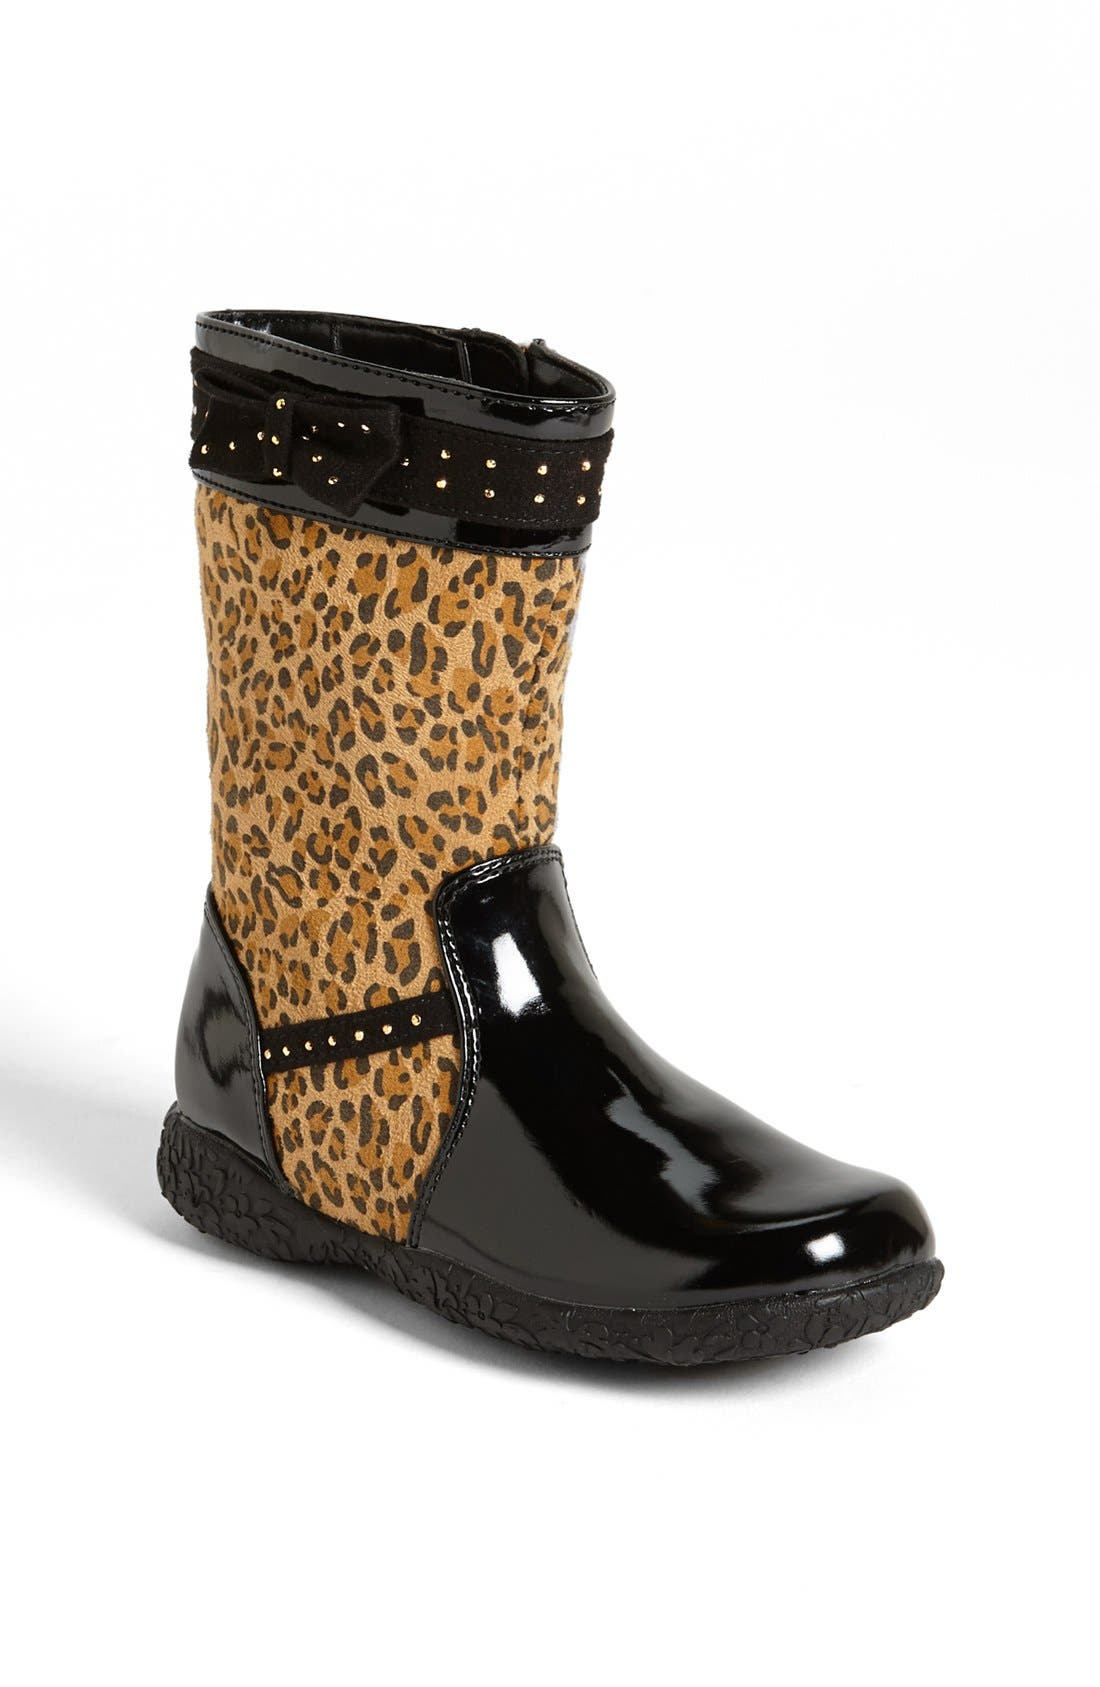 Alternate Image 1 Selected - Nina 'Phoenix' Boot (Walker & Toddler)